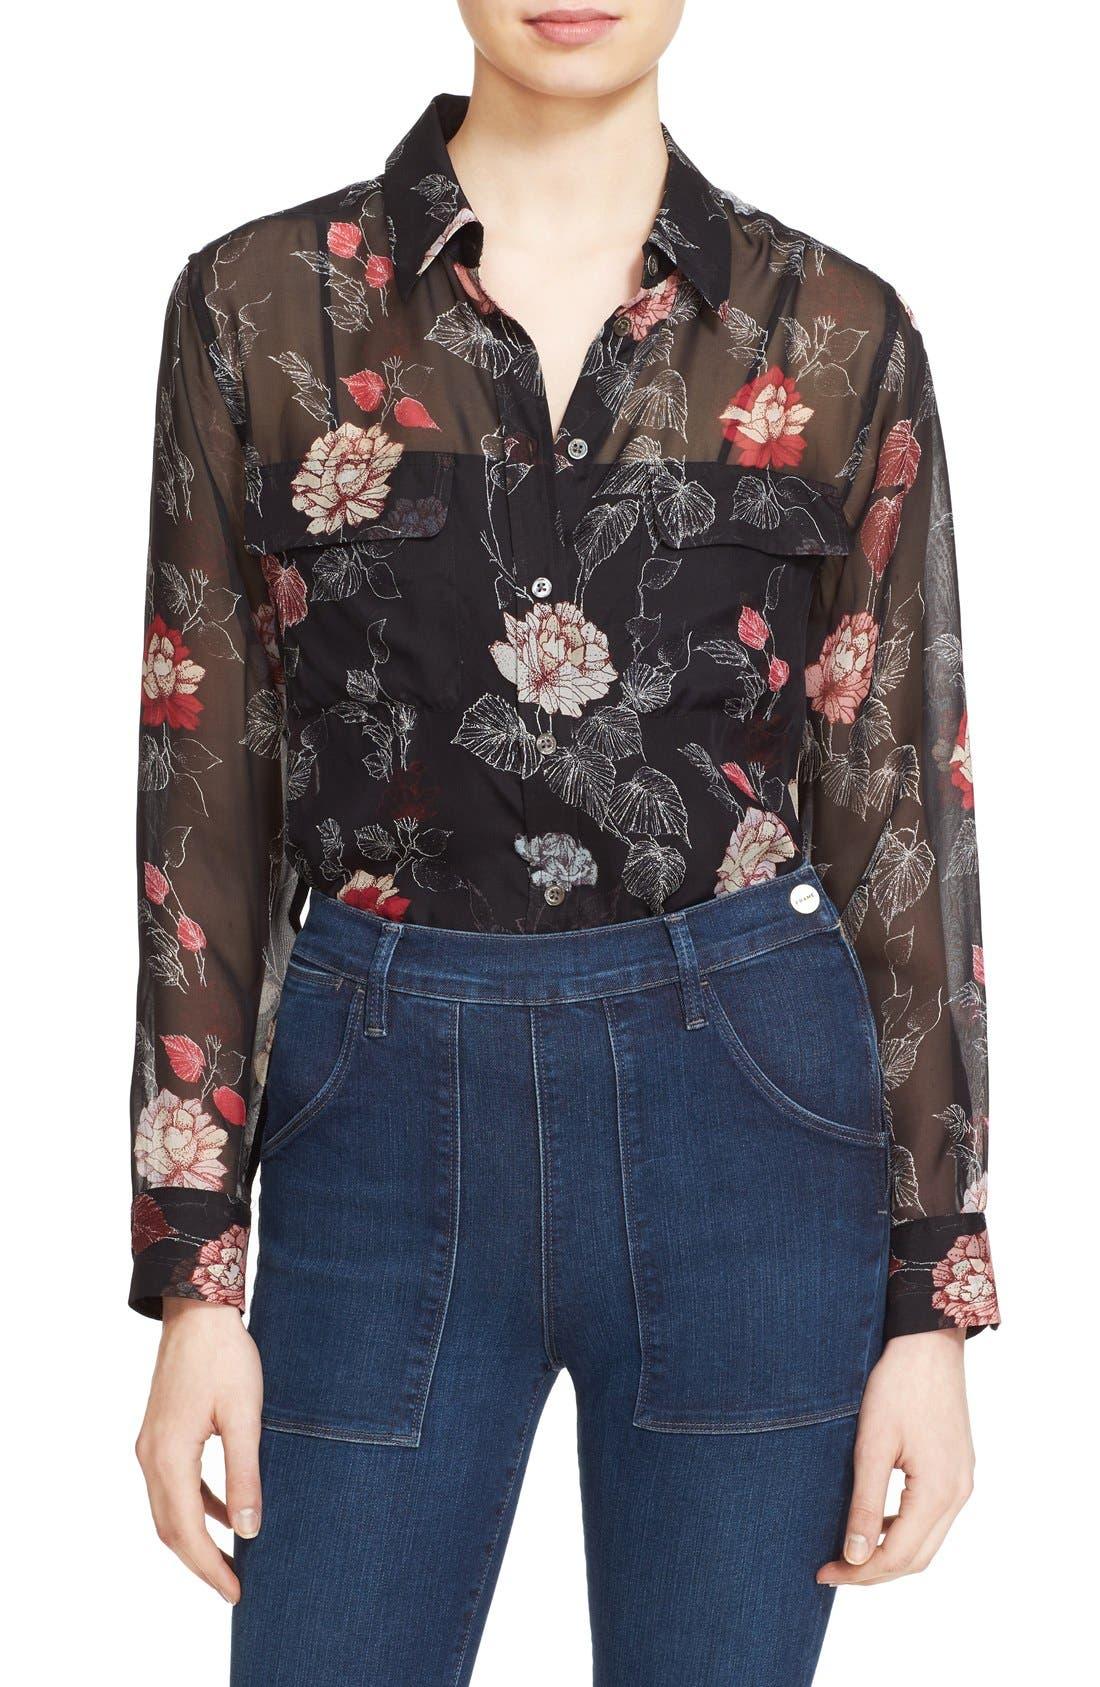 Alternate Image 1 Selected - Equipment 'Signature' Floral Print Silk Shirt